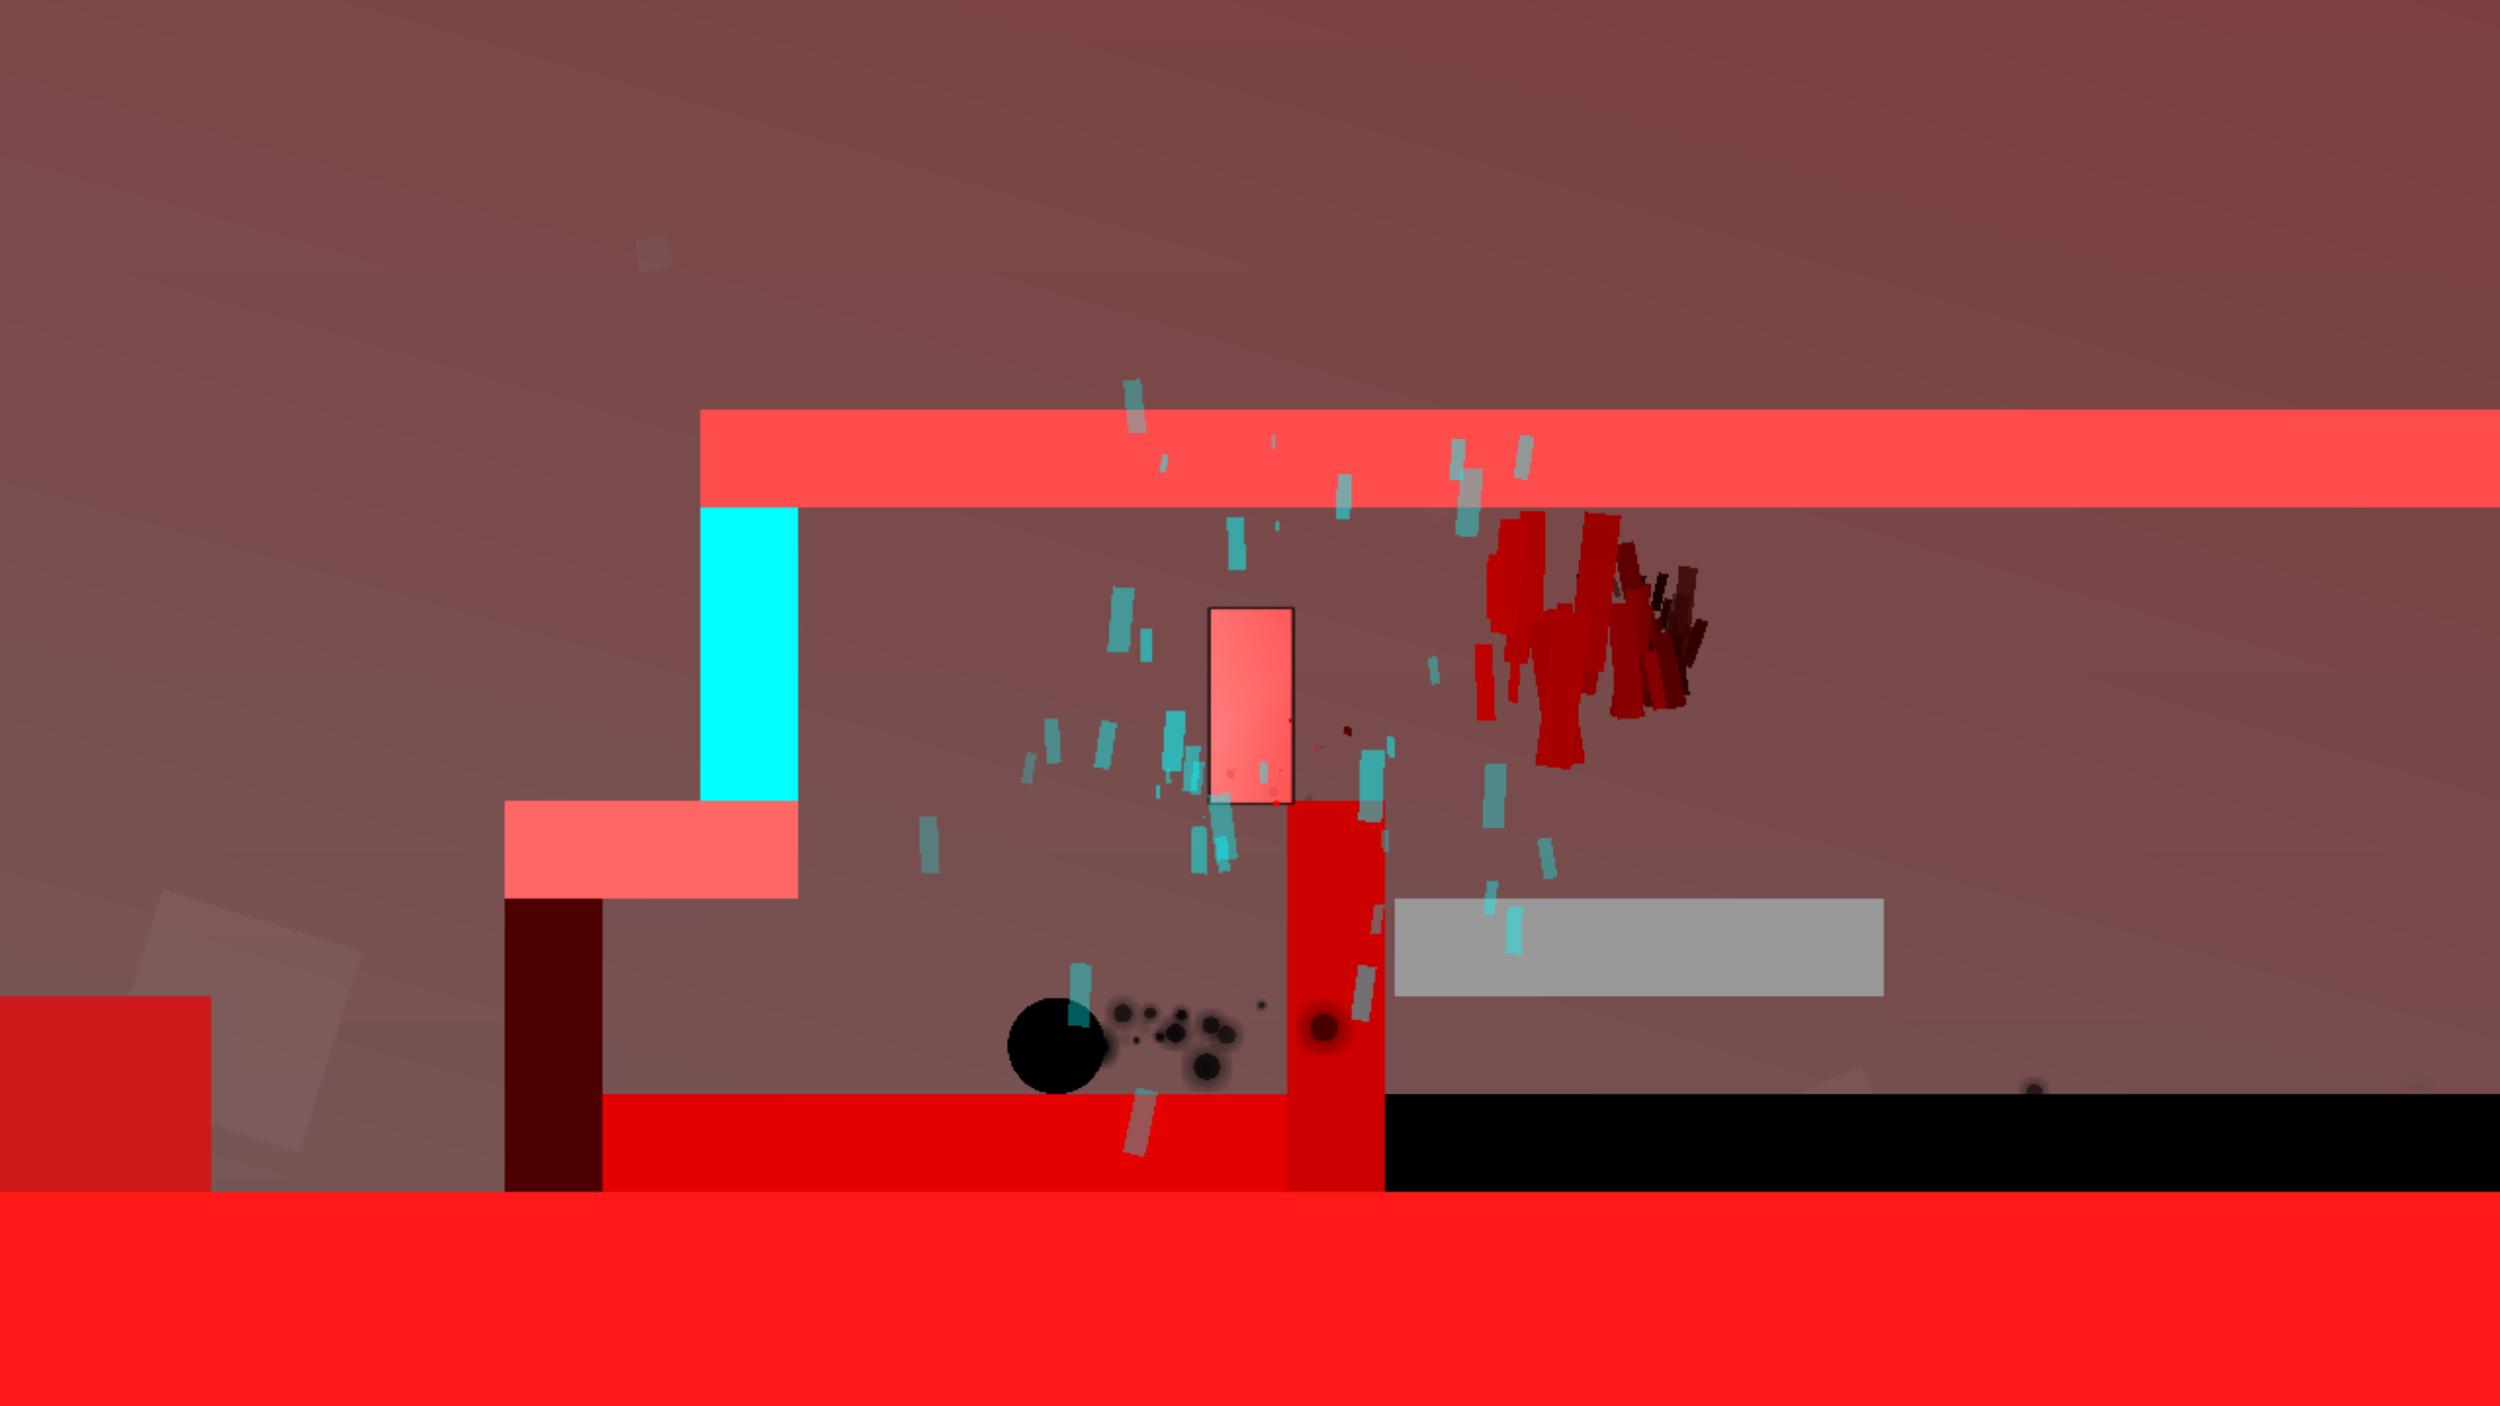 CrashballScreenshot3.png